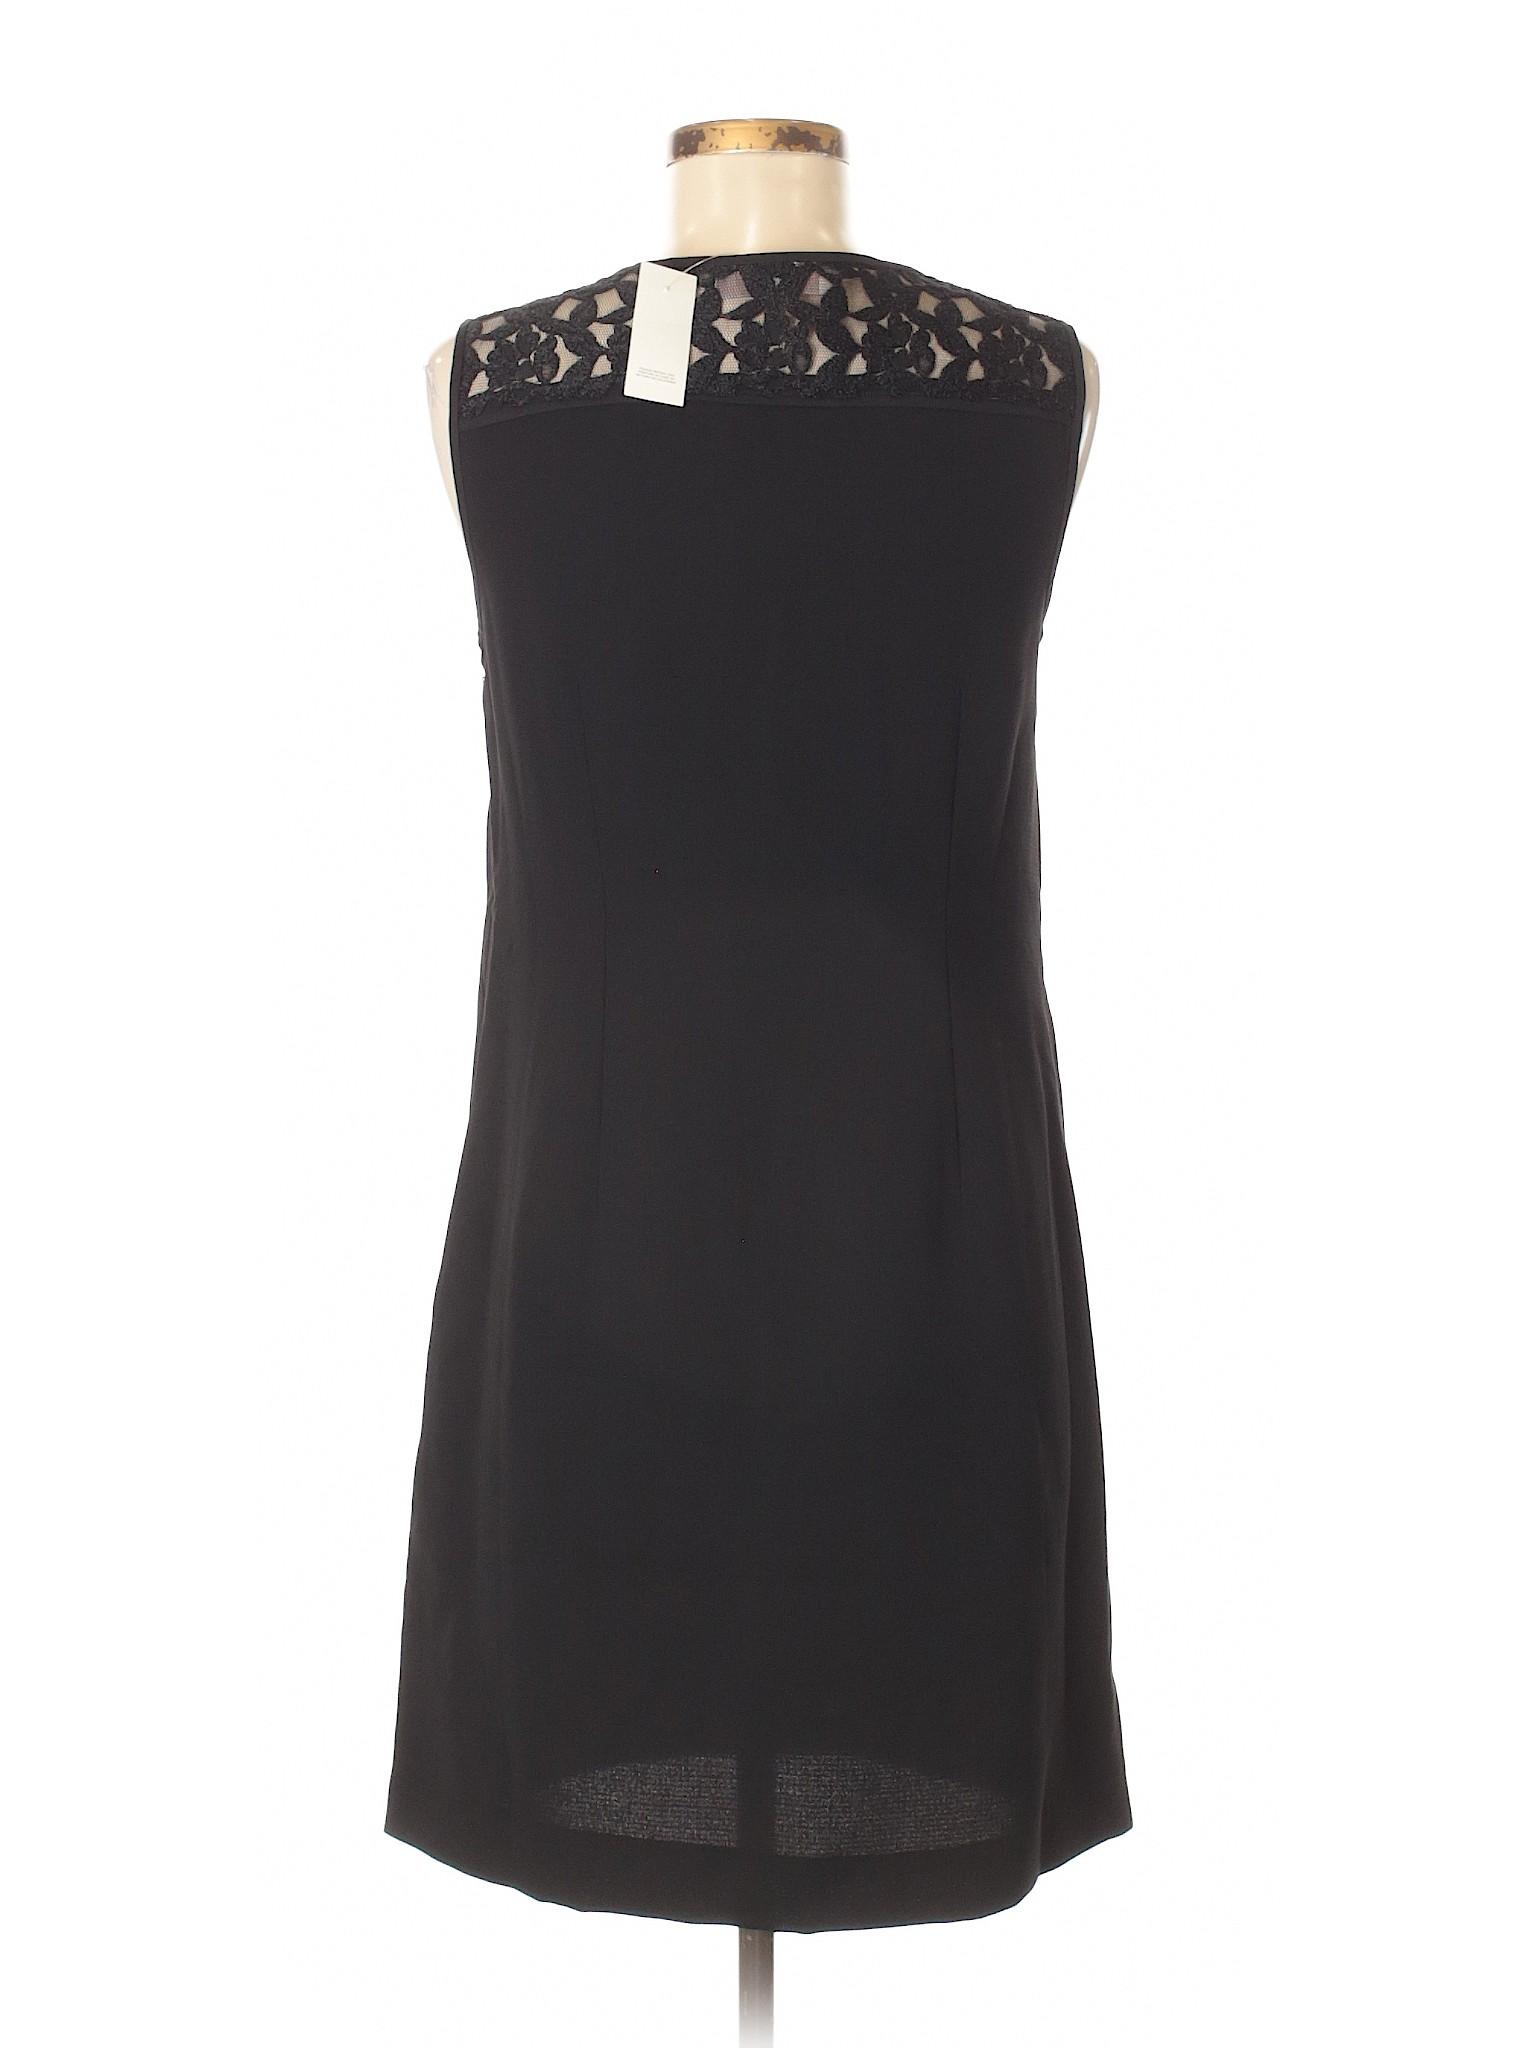 Taylor Casual Dress Boutique winter LOFT Ann EUq6xwnS